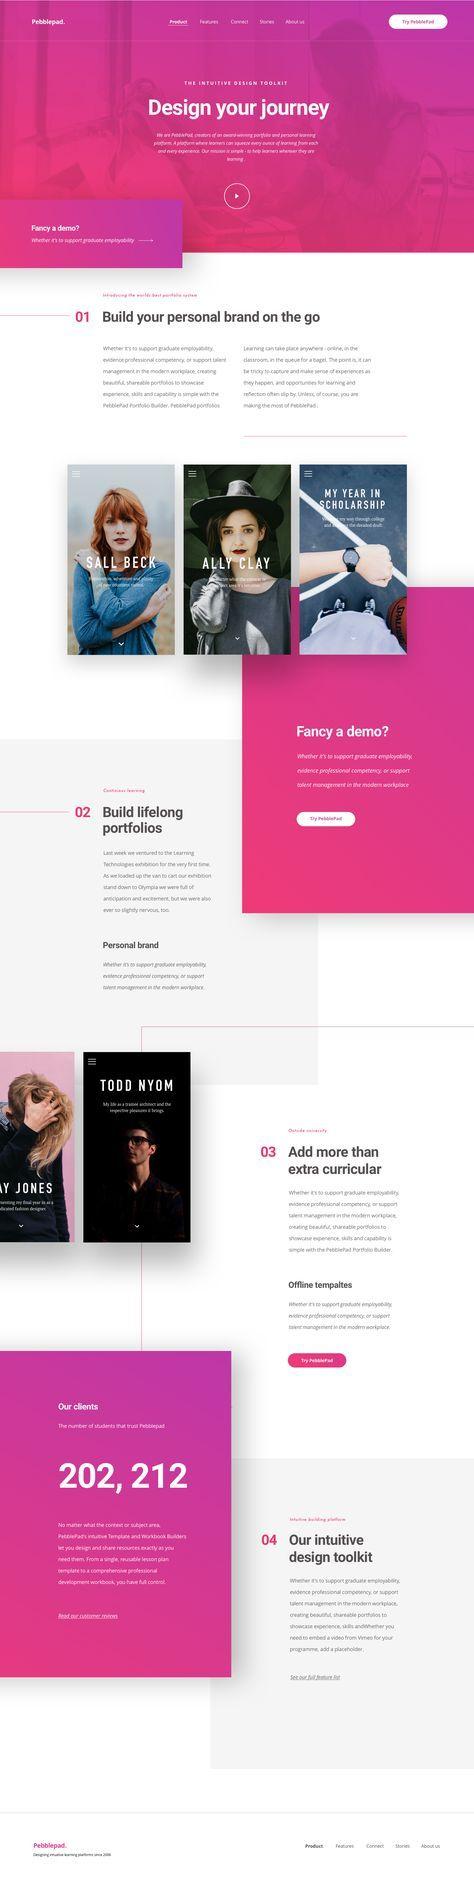 Pebble Home New Web Design Web Development Design Web Template Design